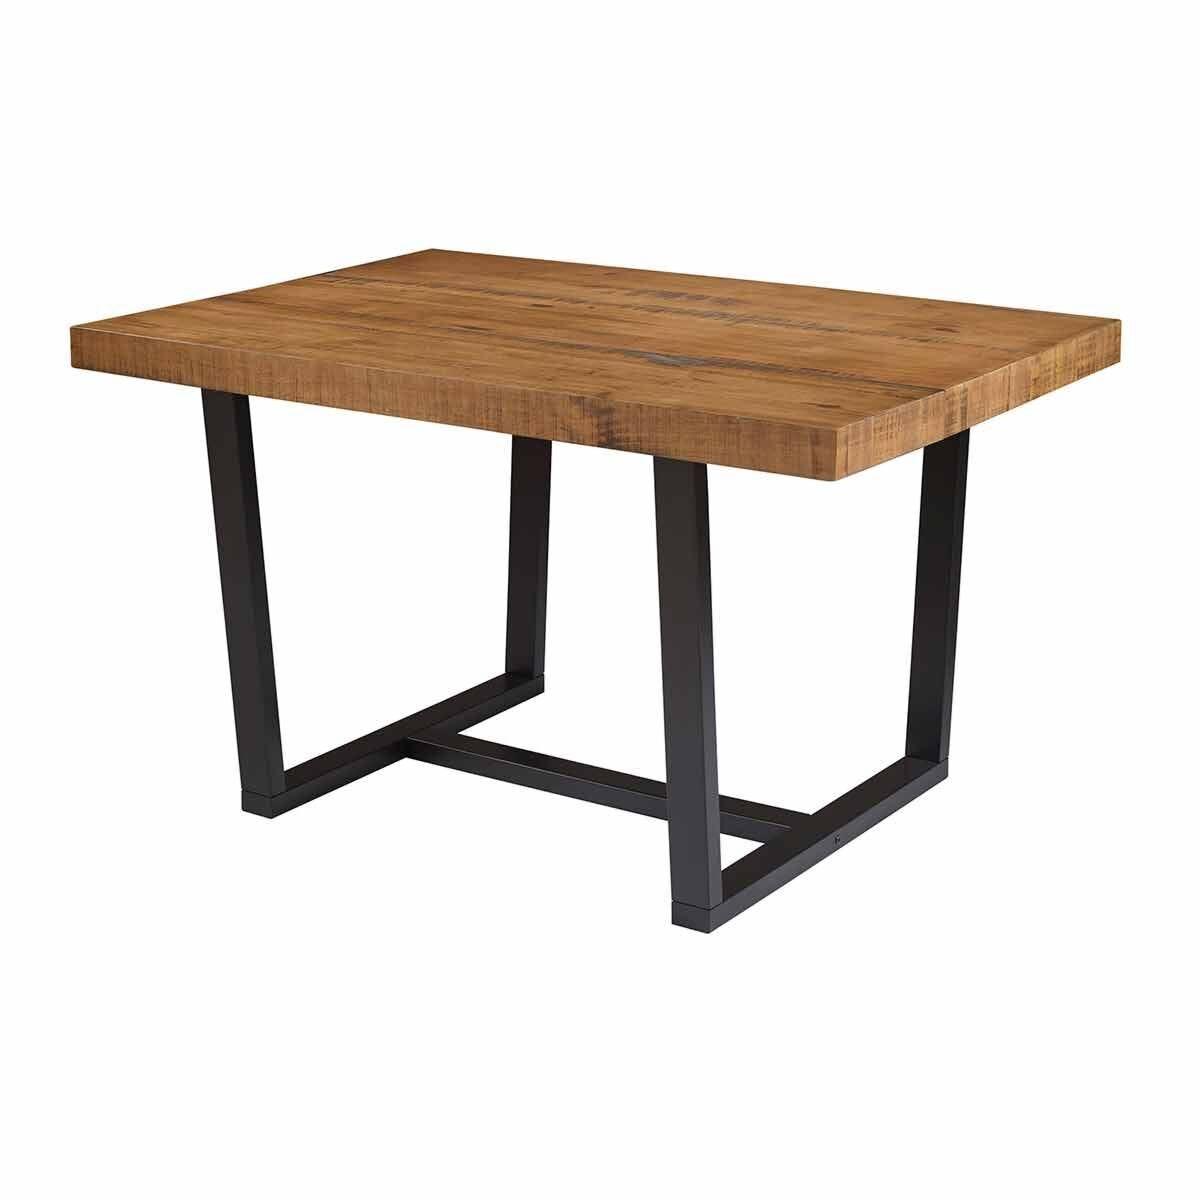 Rimini Distressed Solid Wood Dining Table Oak Effect